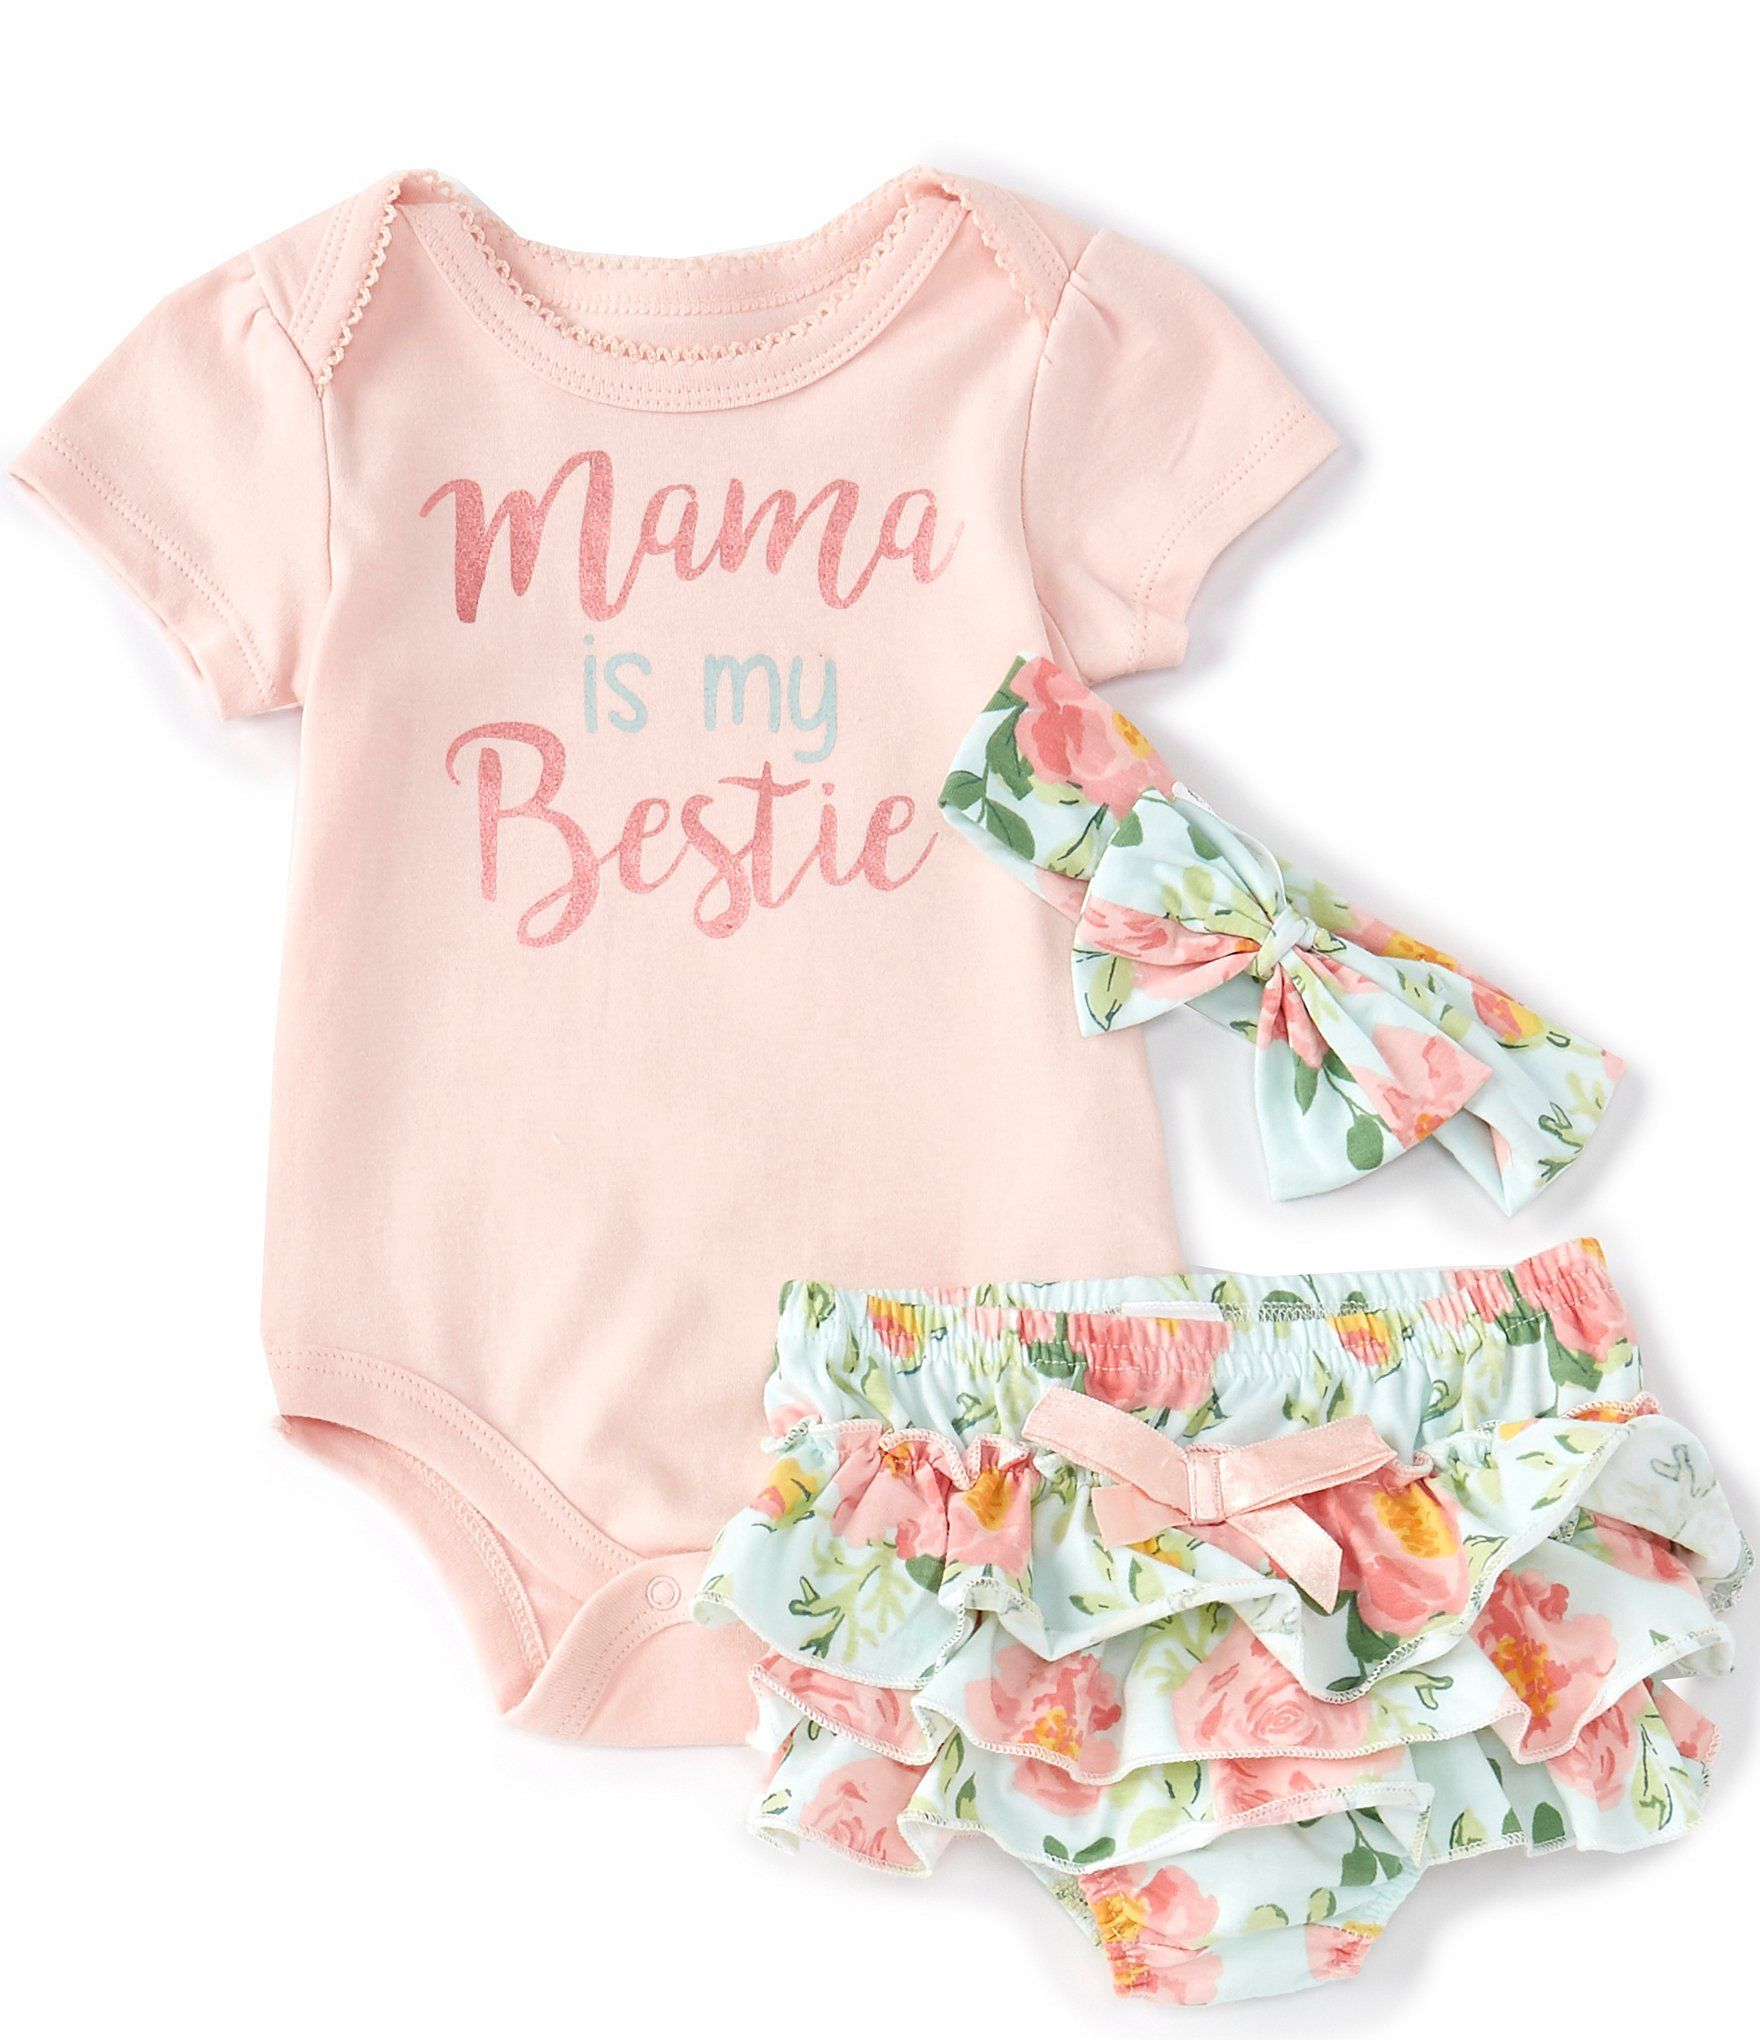 Baby Starters Baby Girls Newborn-9 Months Short-Sleeve Mama Is My Bestie Bodysuit, Floral Panty & Headband Set | Dillard's